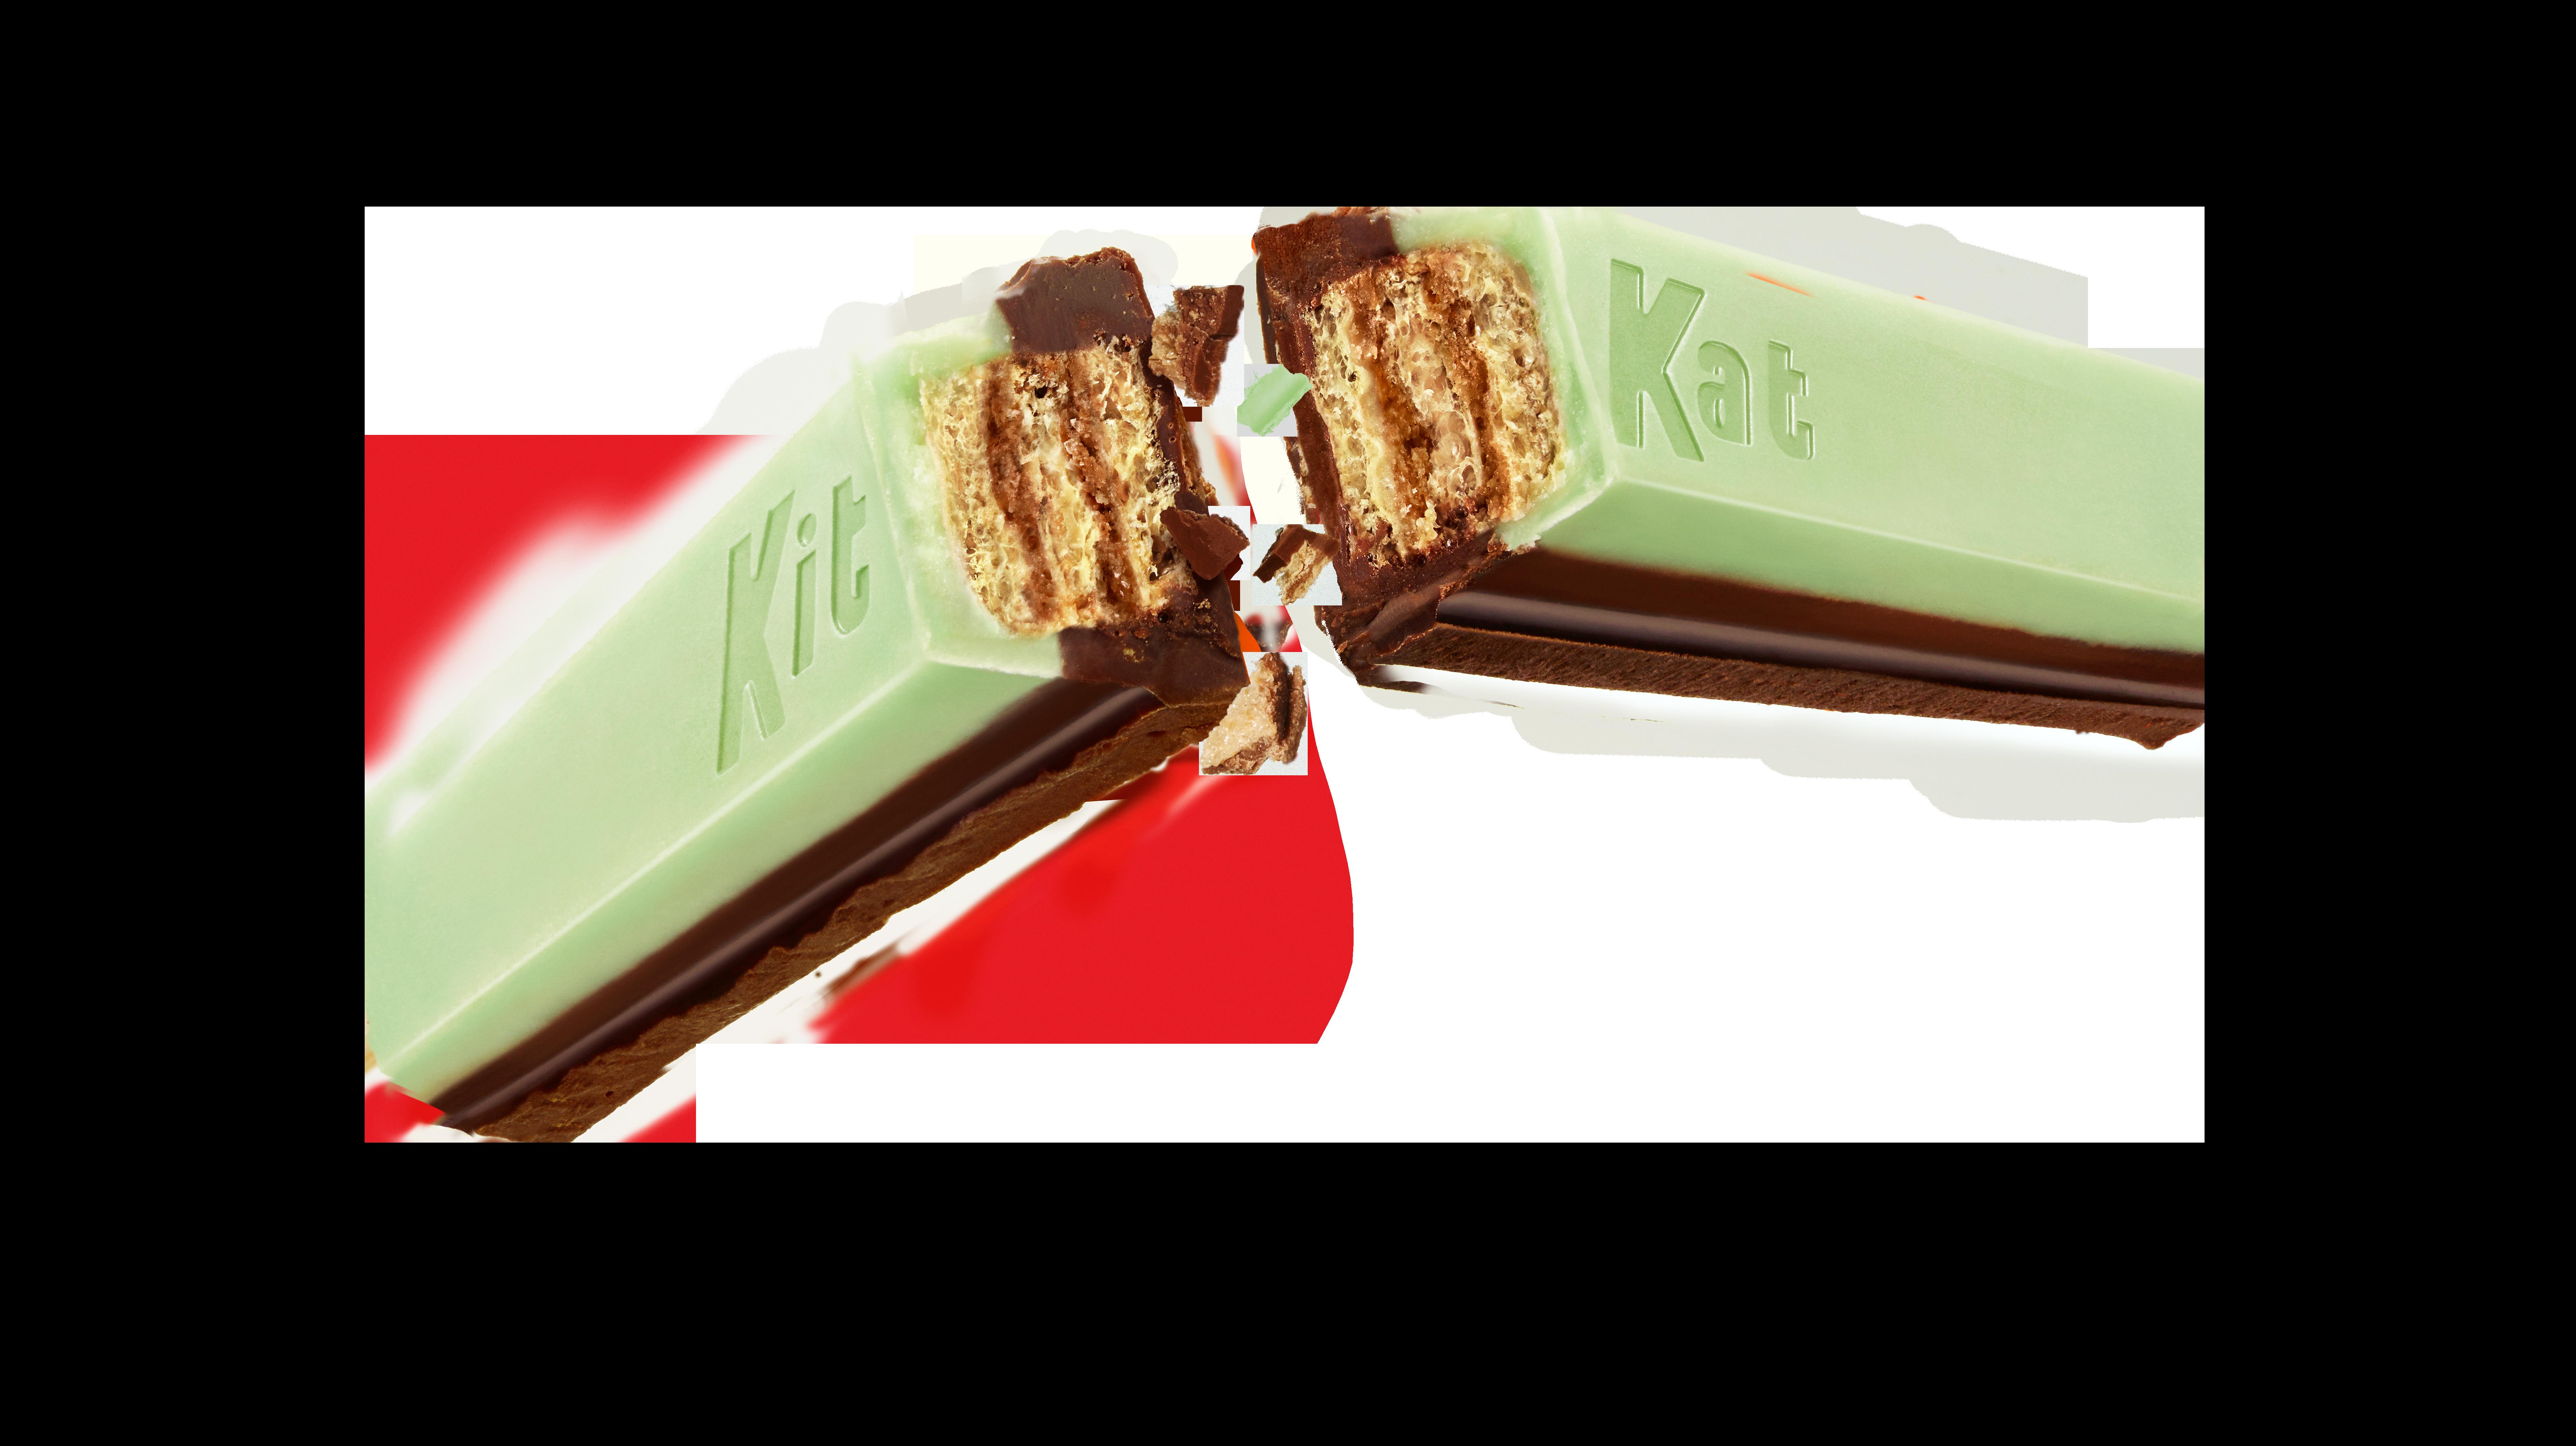 KIT KAT Duos Mint + Dark Chocolate Break